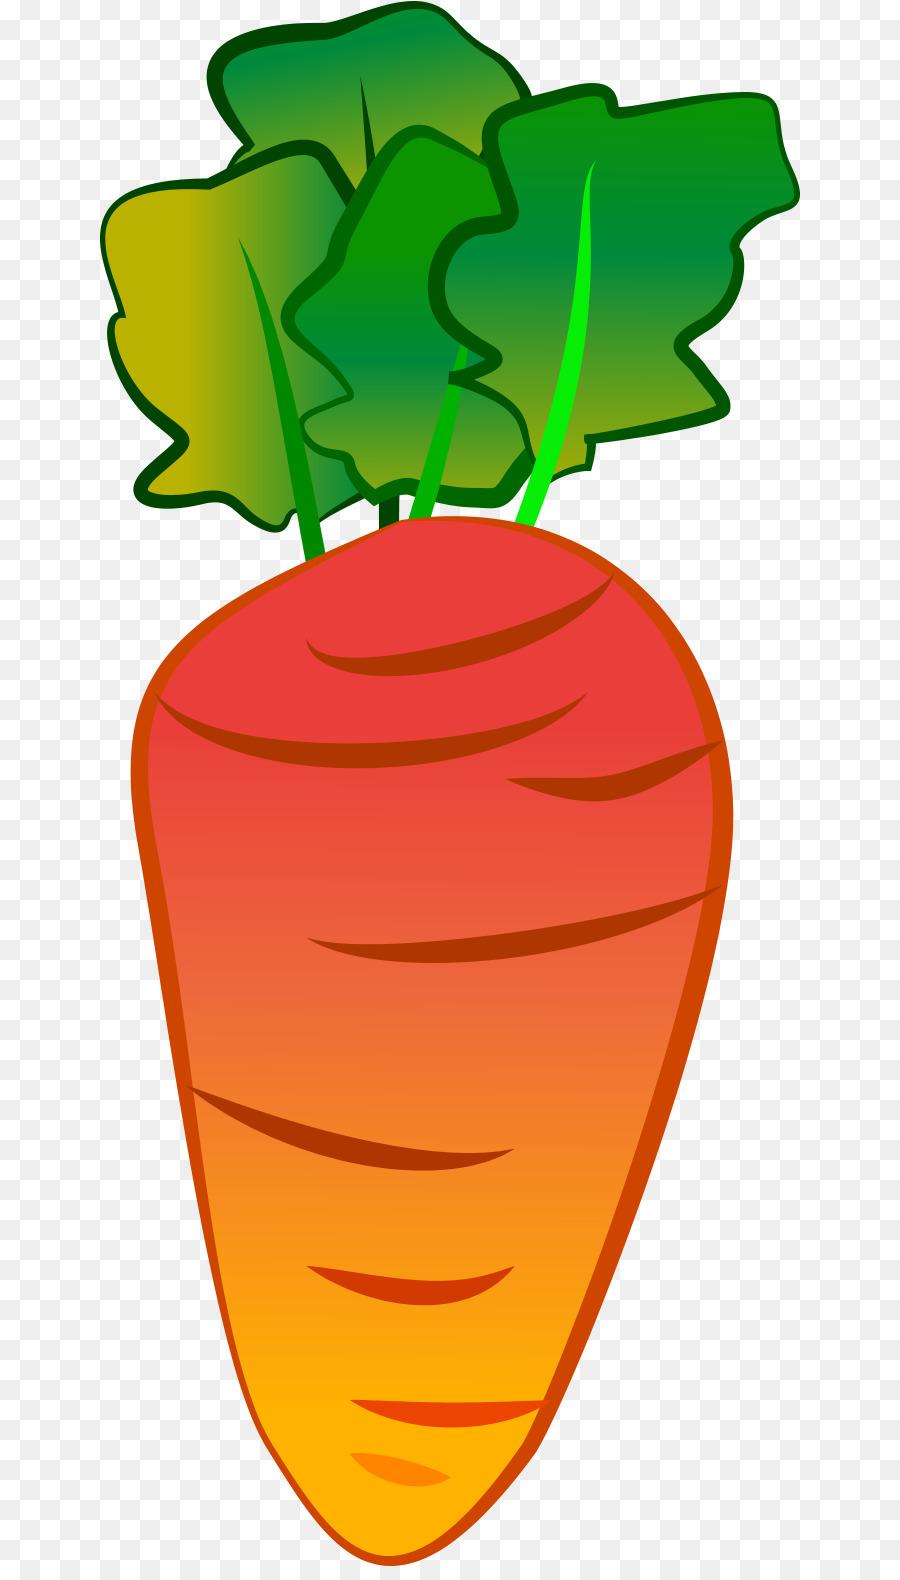 Carrot clipart vegetable. Cartoon clip art carrots